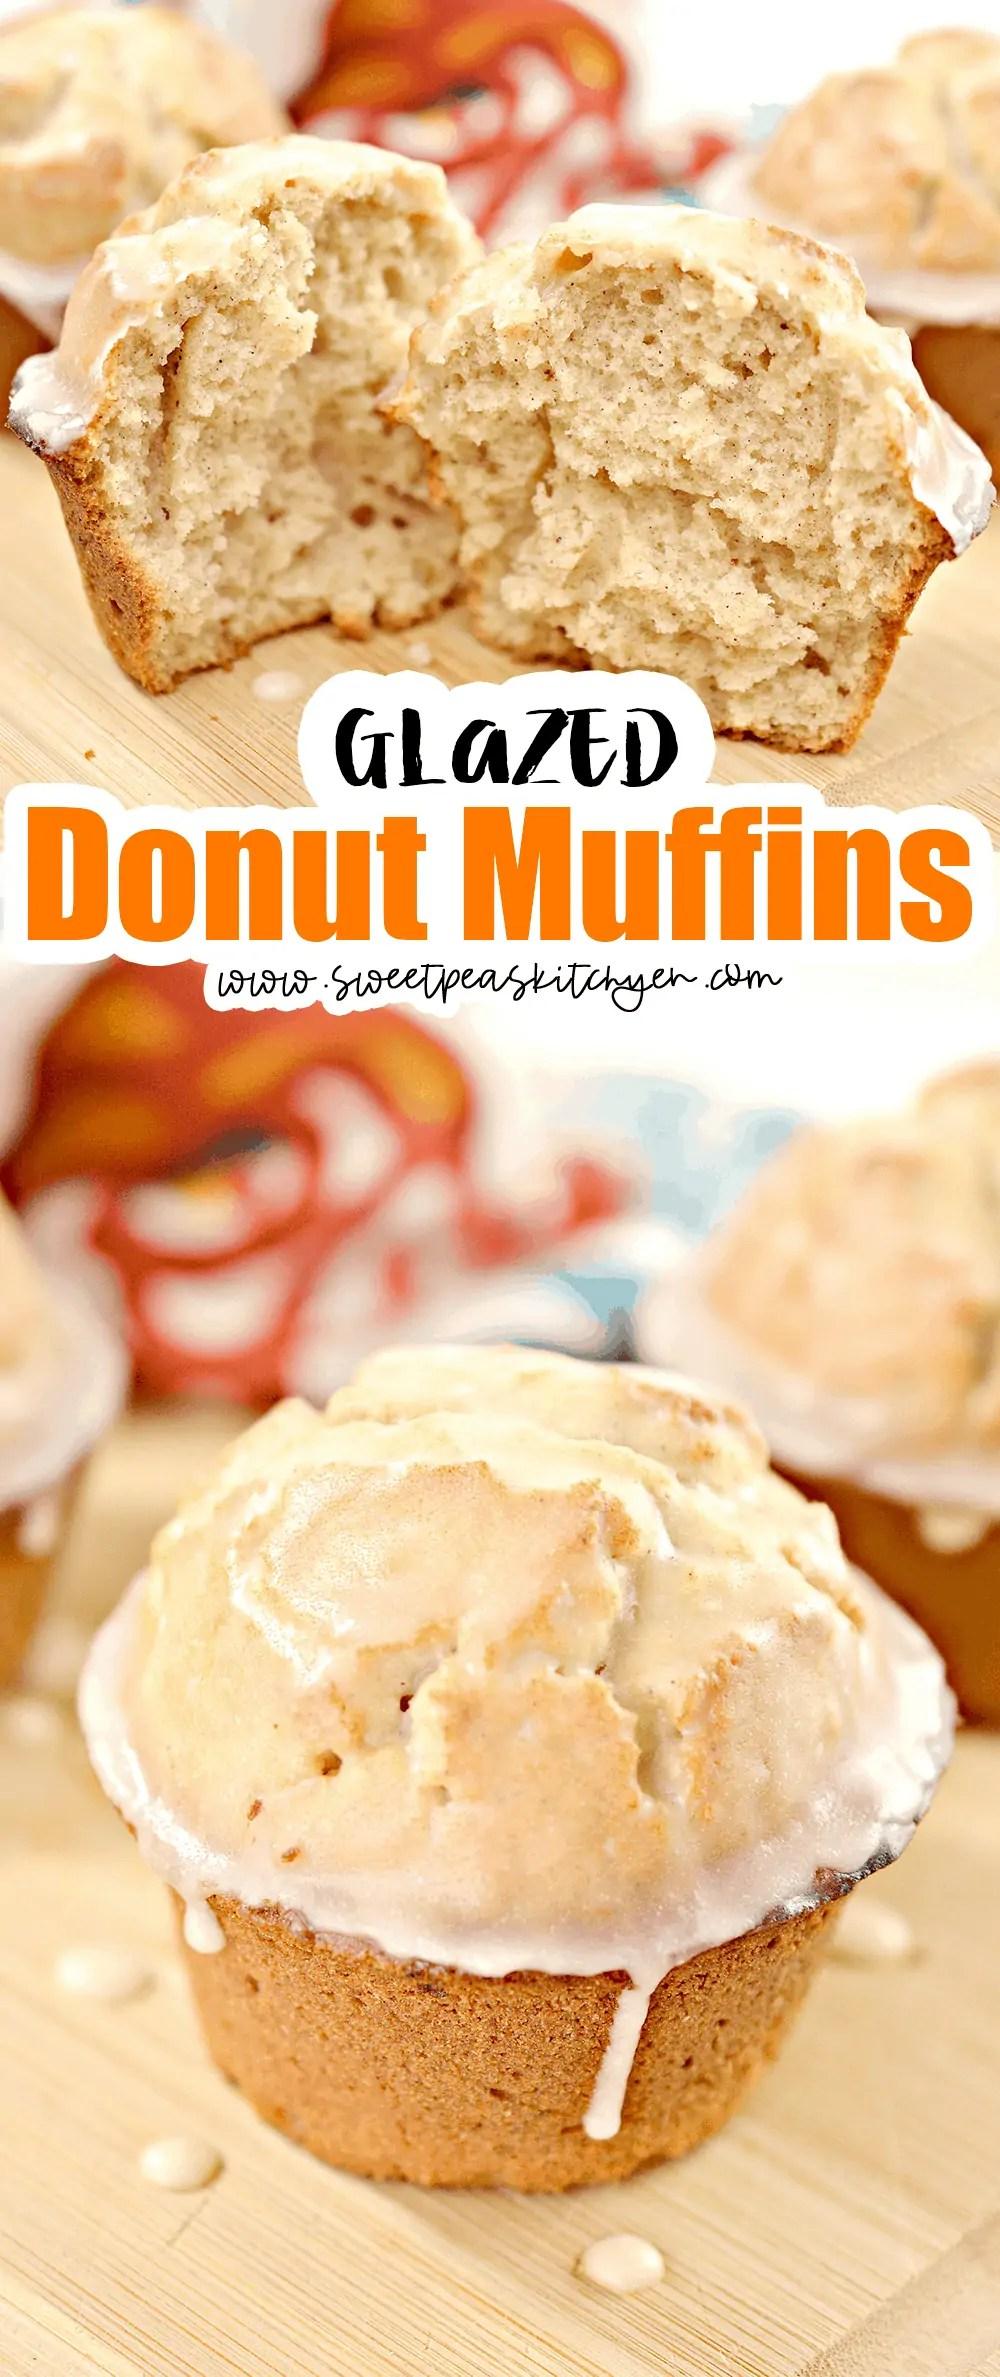 Glazed Donut Muffins Pinterest PIN